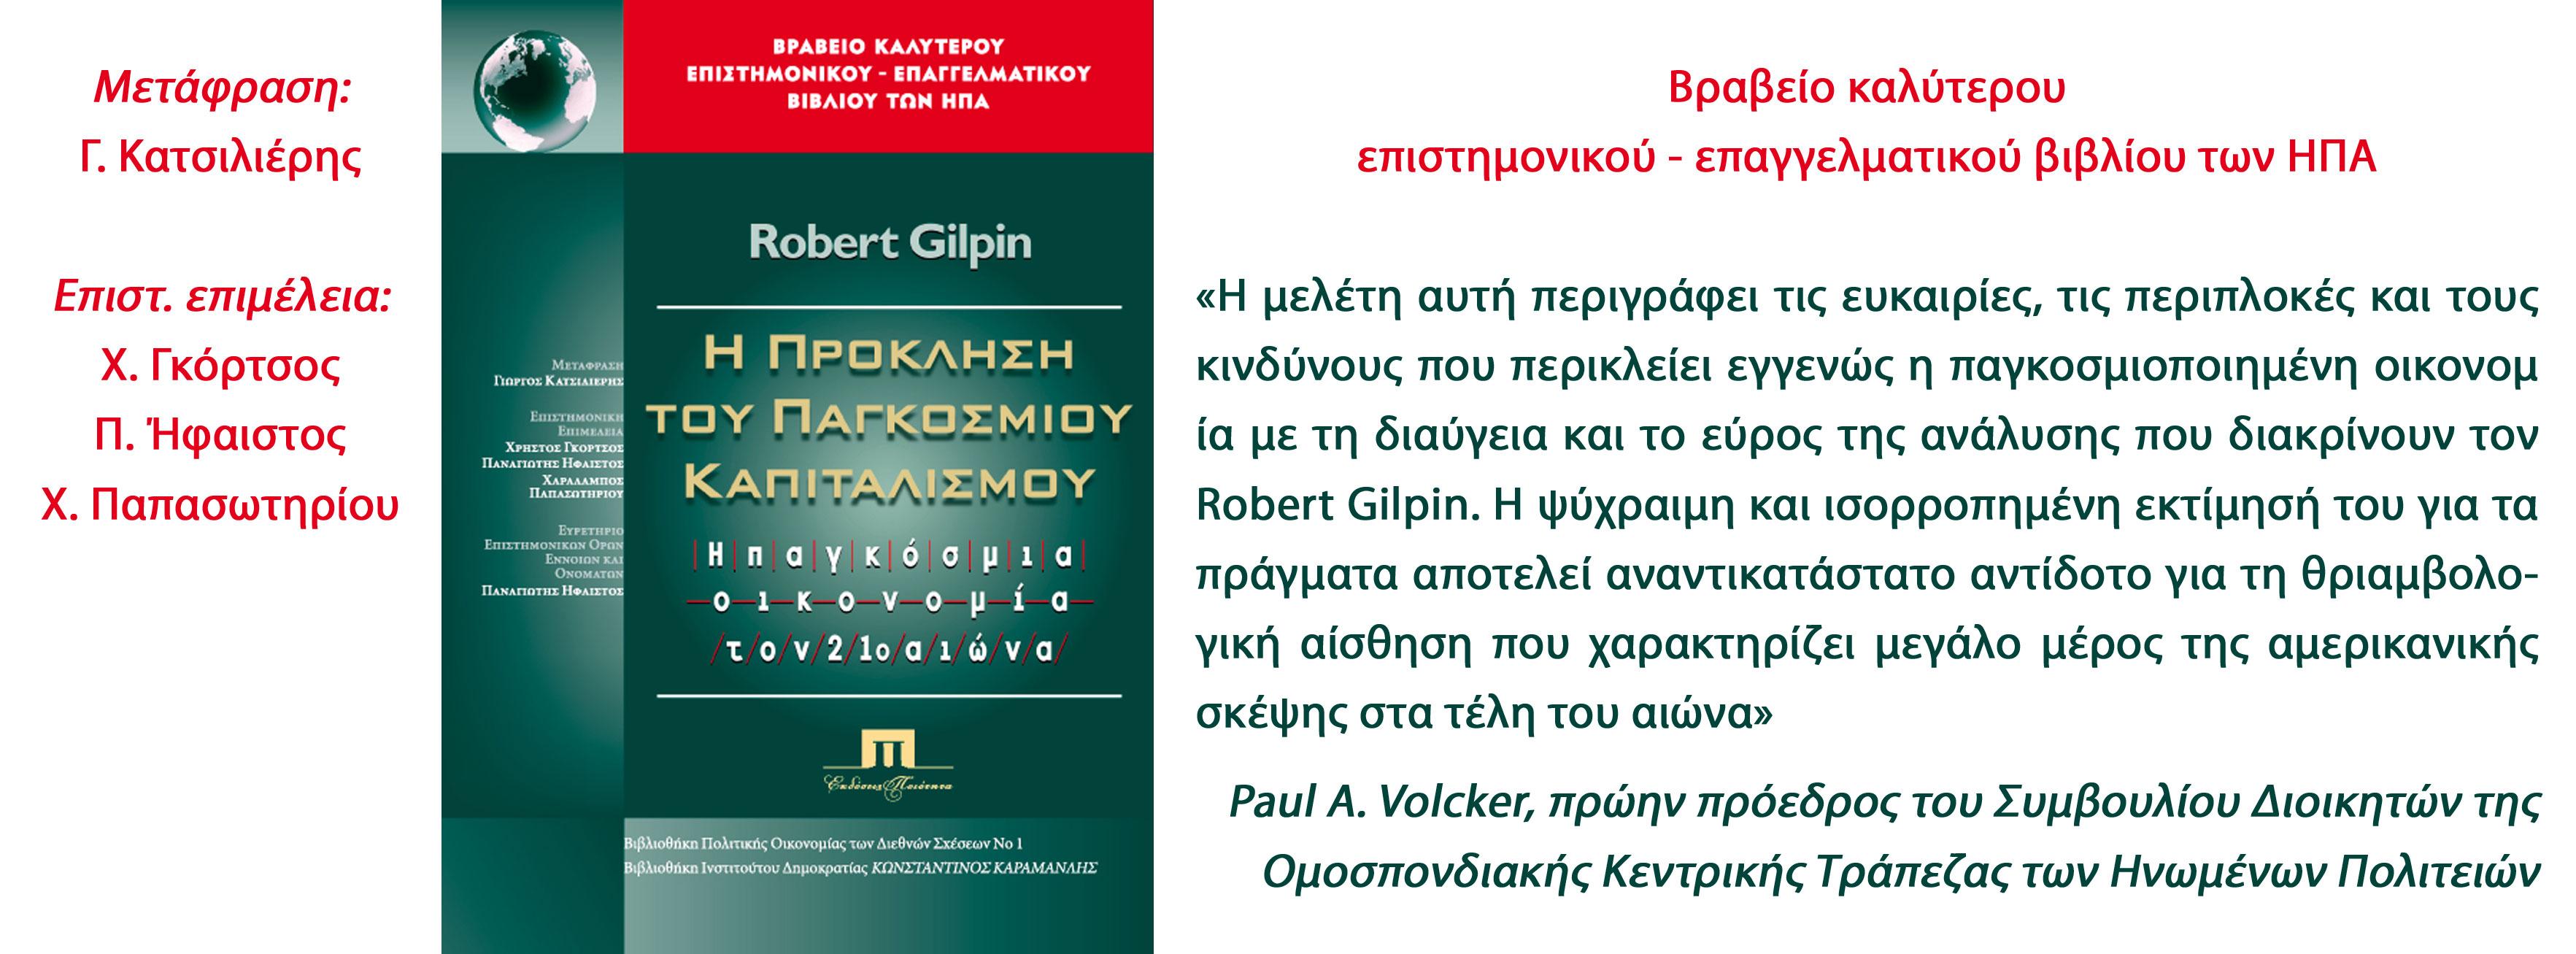 Robert Gilpin, Η πρόκληση του παγκόσμιου καπιταλισμού